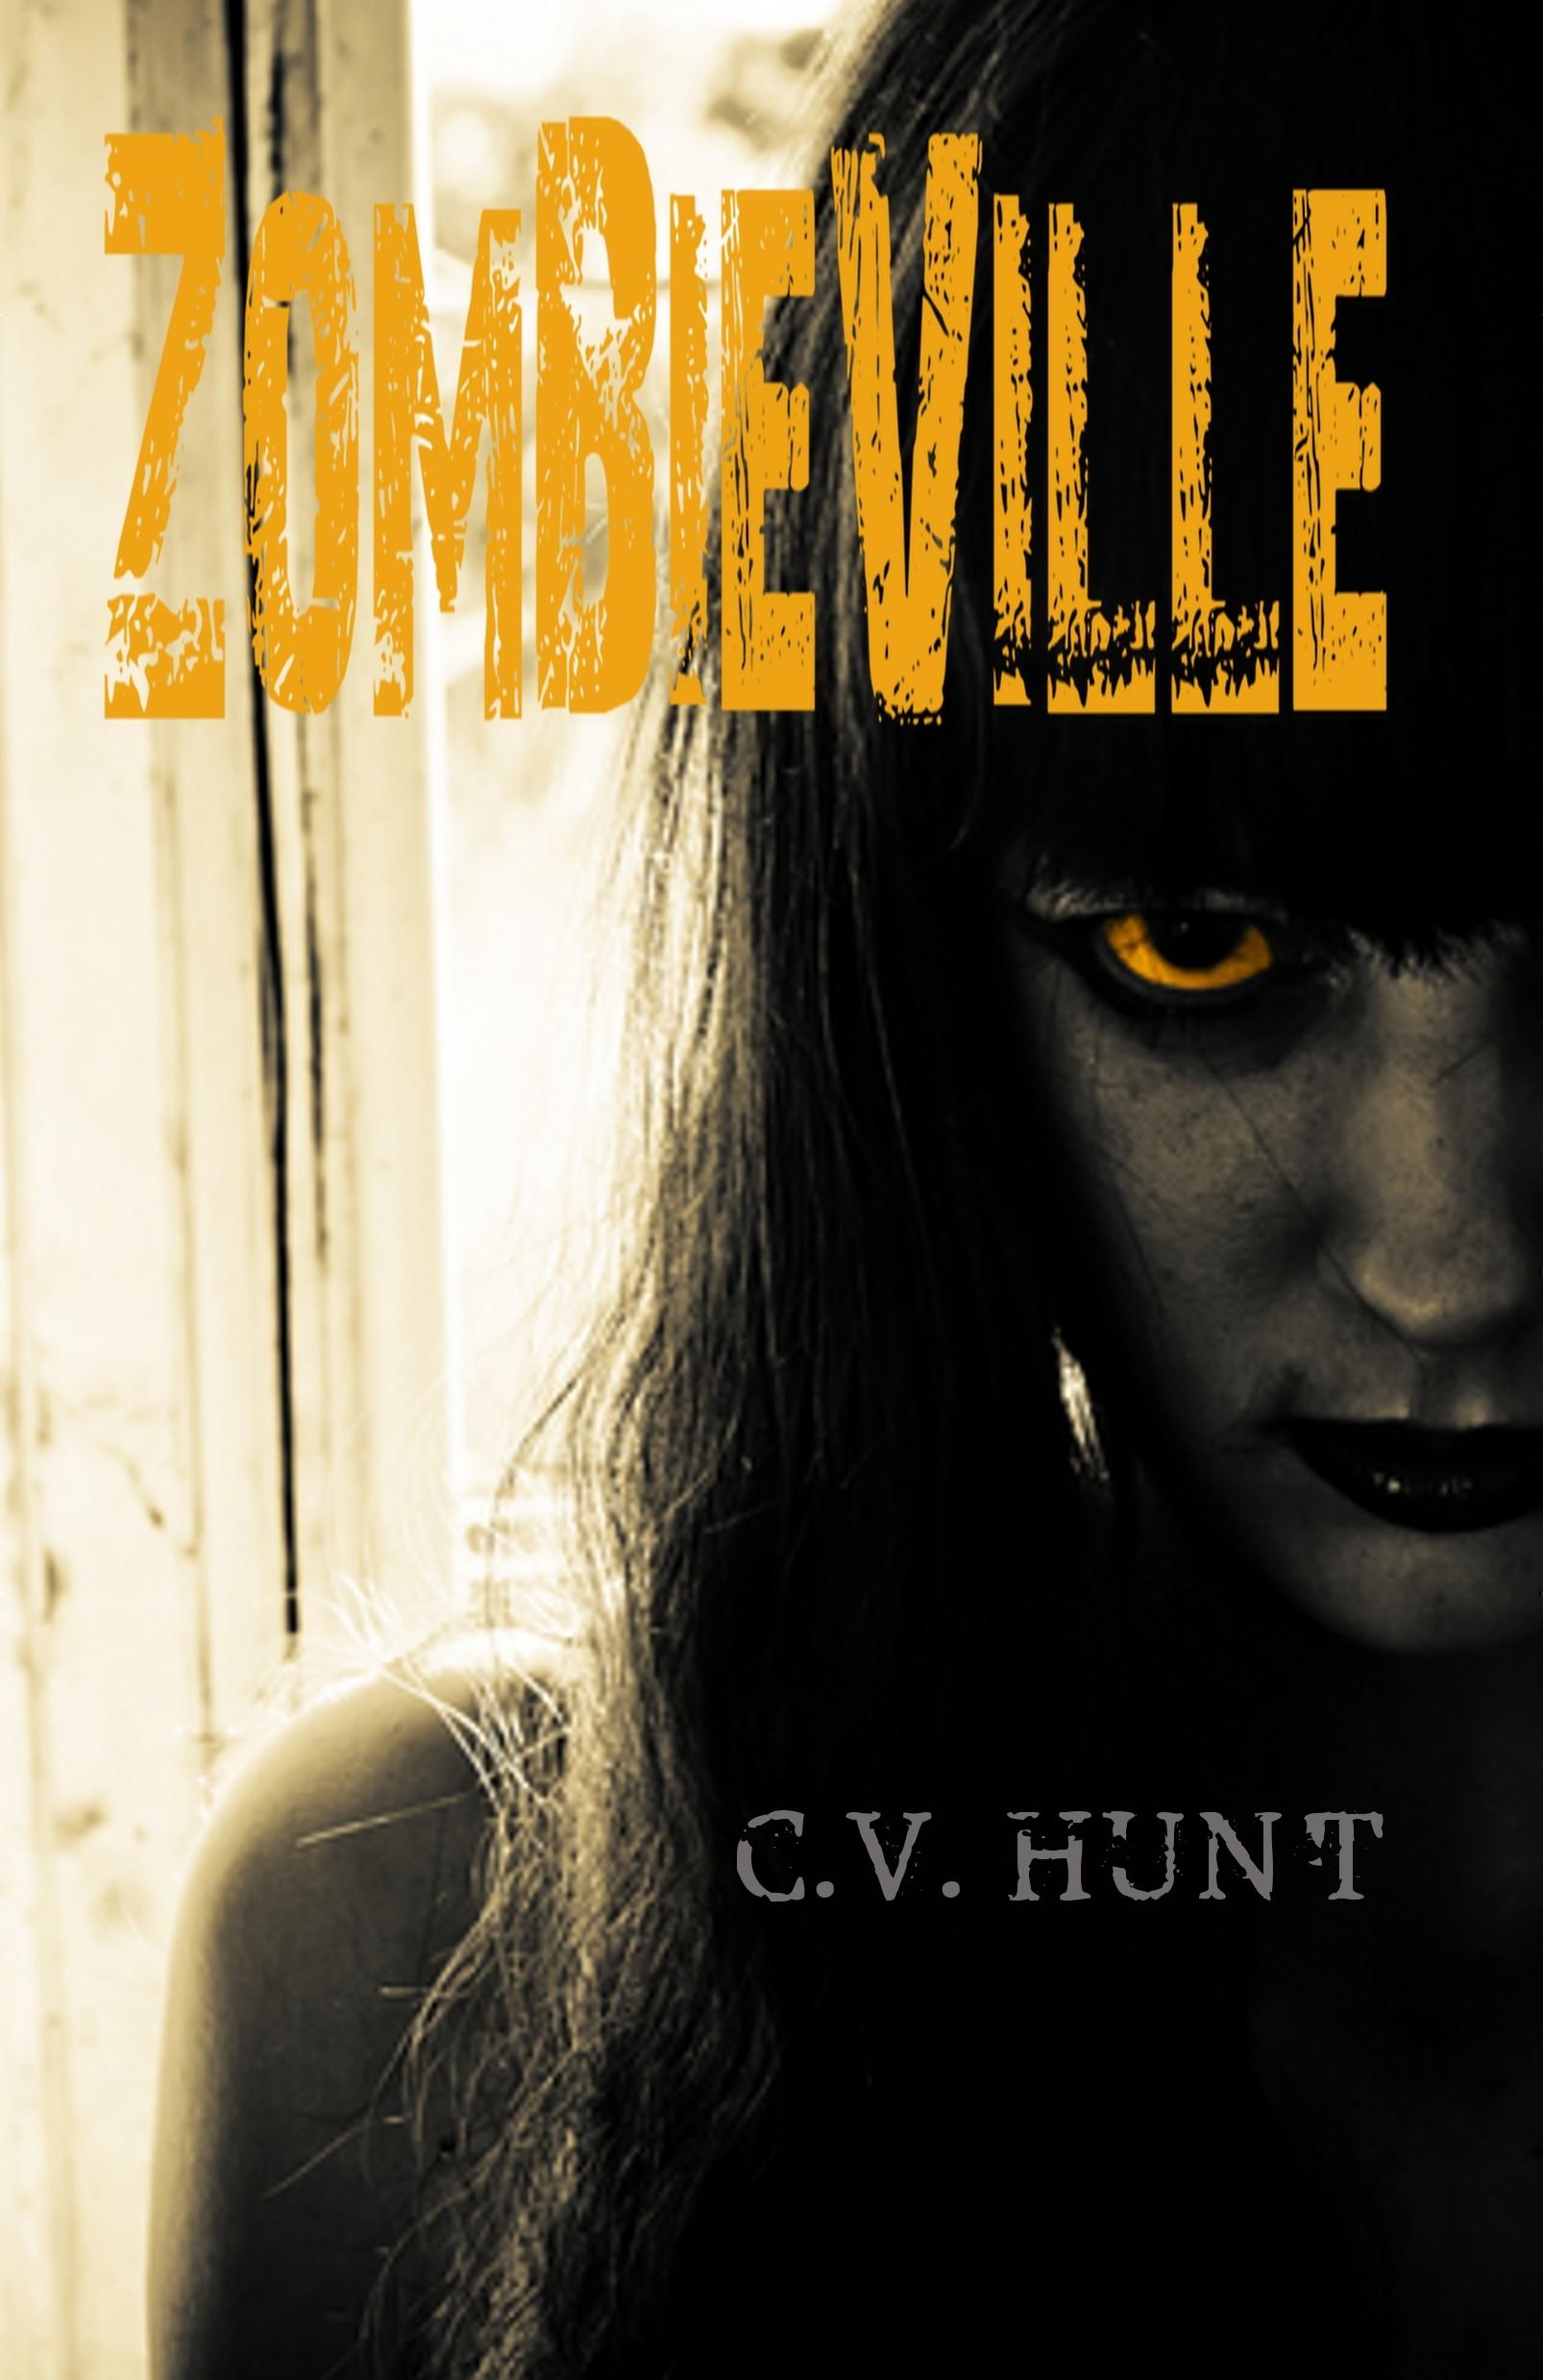 Zombieville C.V. Hunt